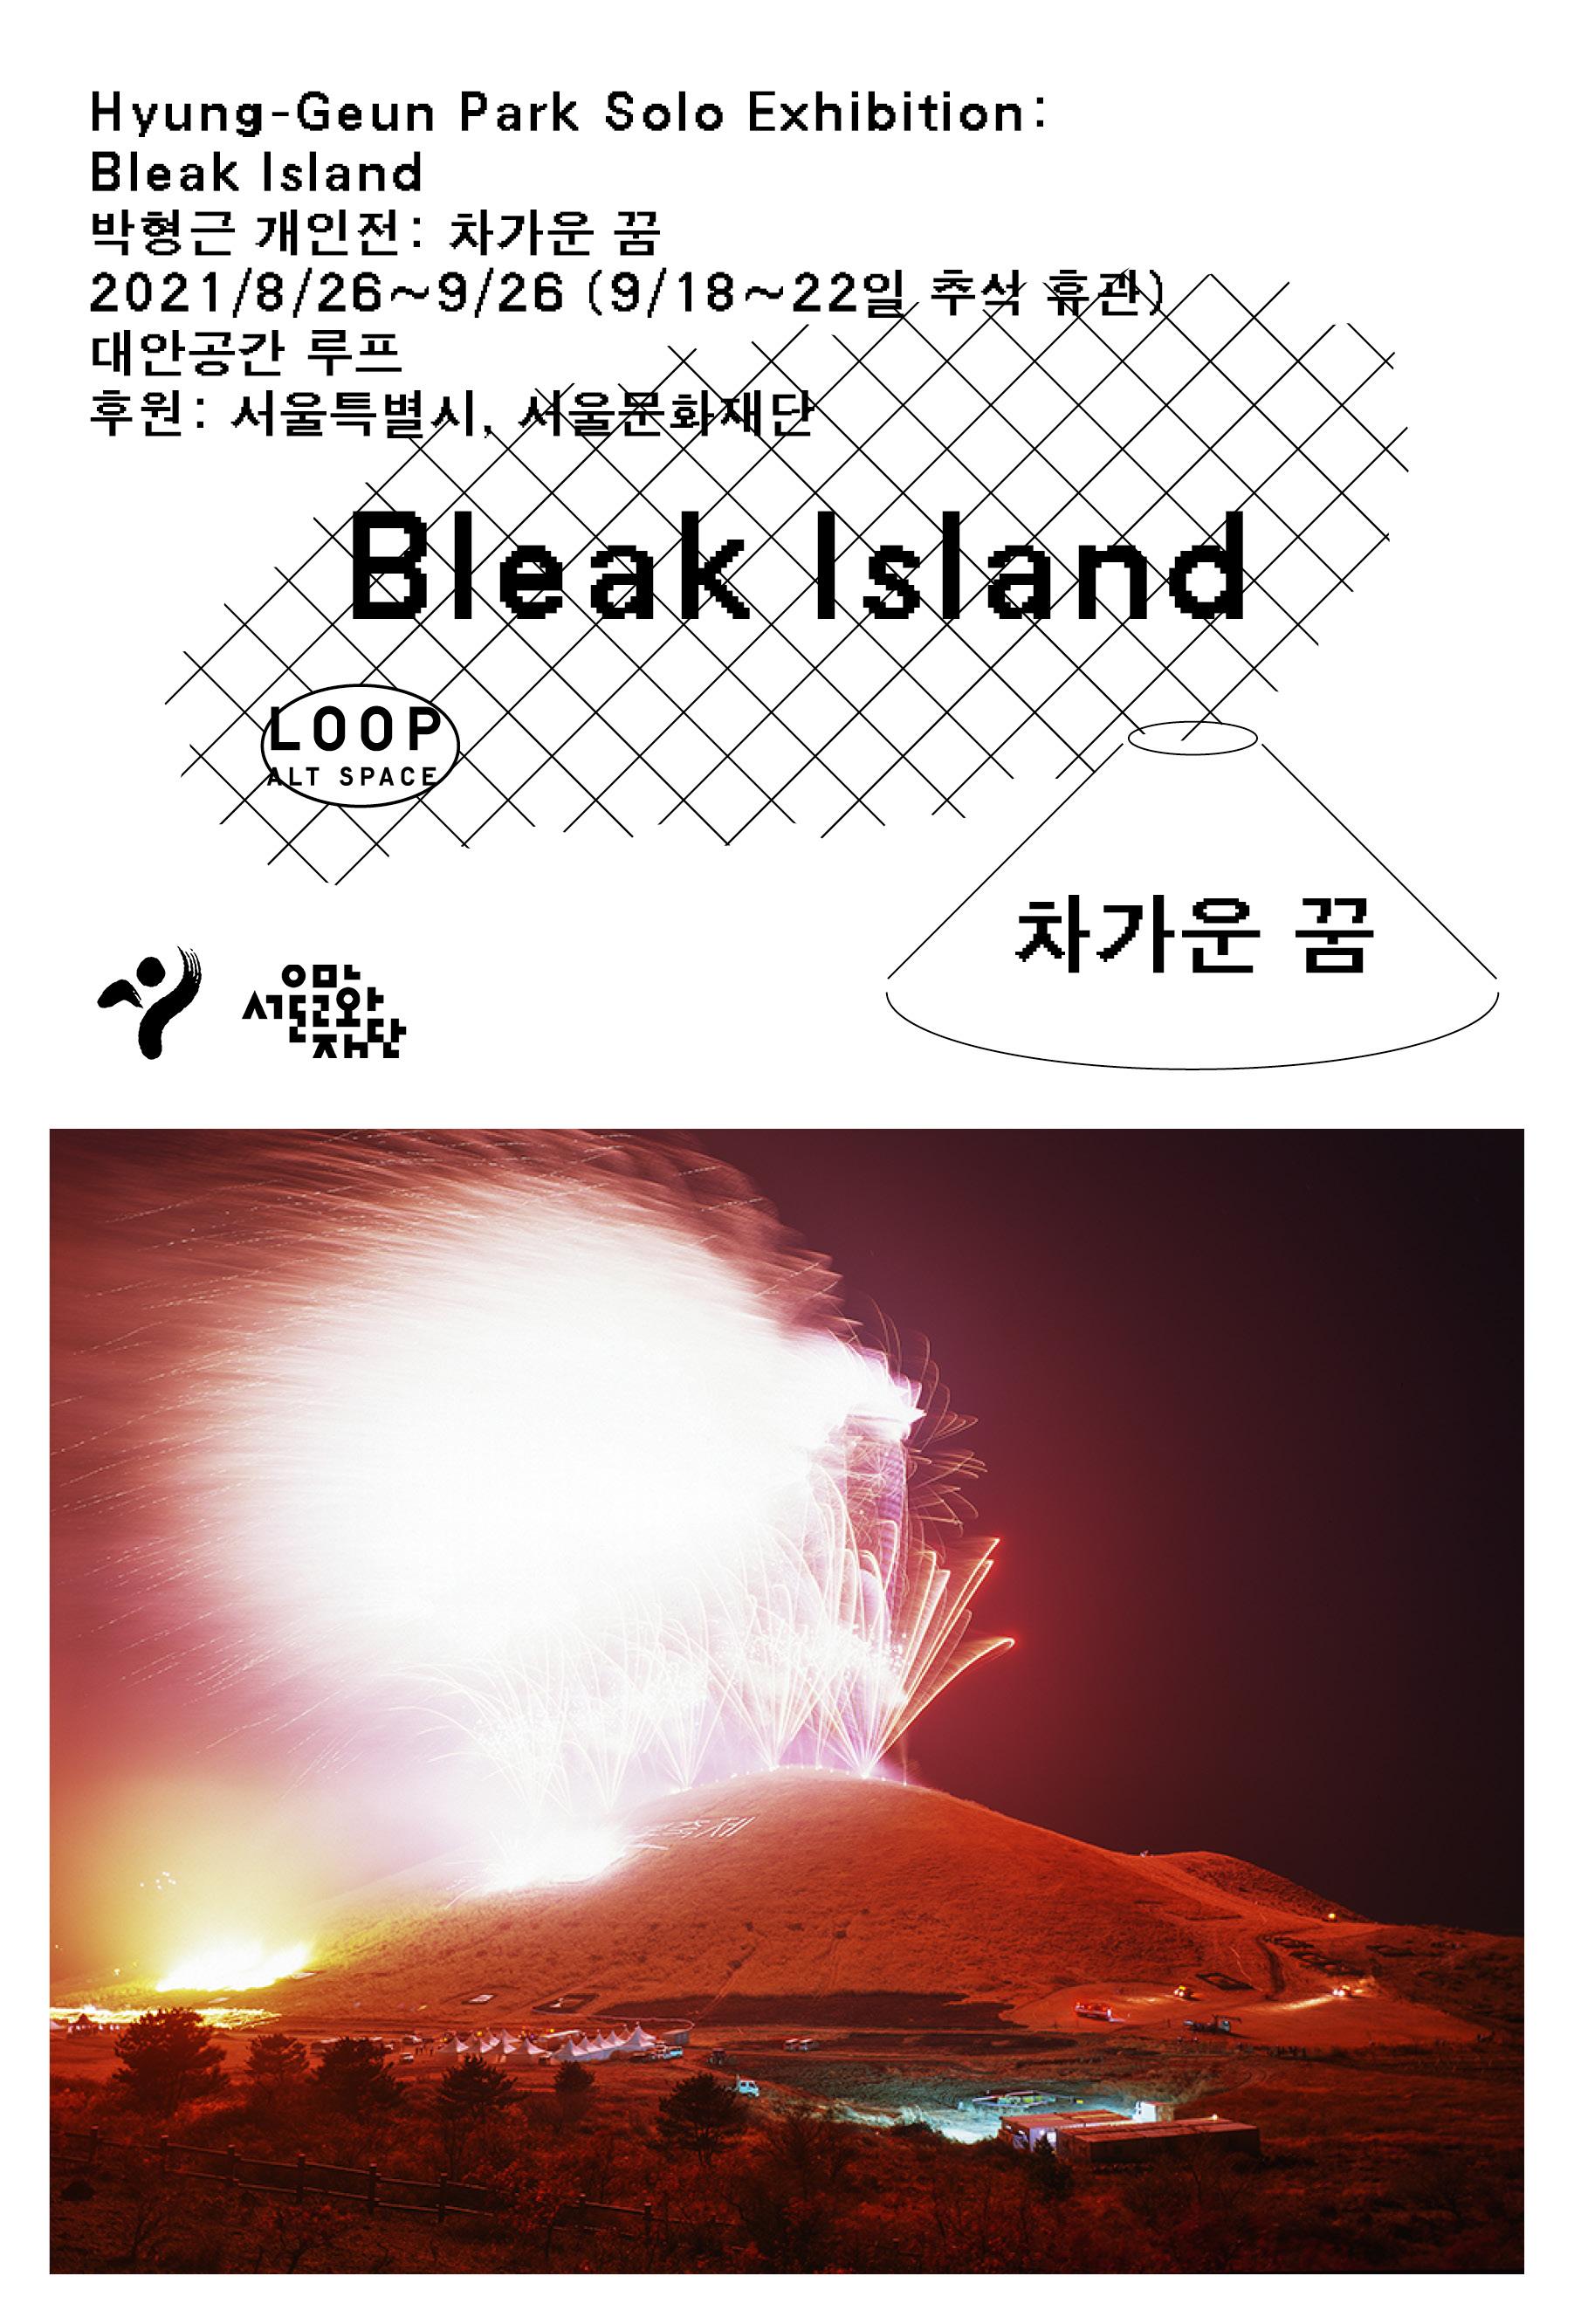 Hyung-Geun Park Solo Exhibition: Bleak Island